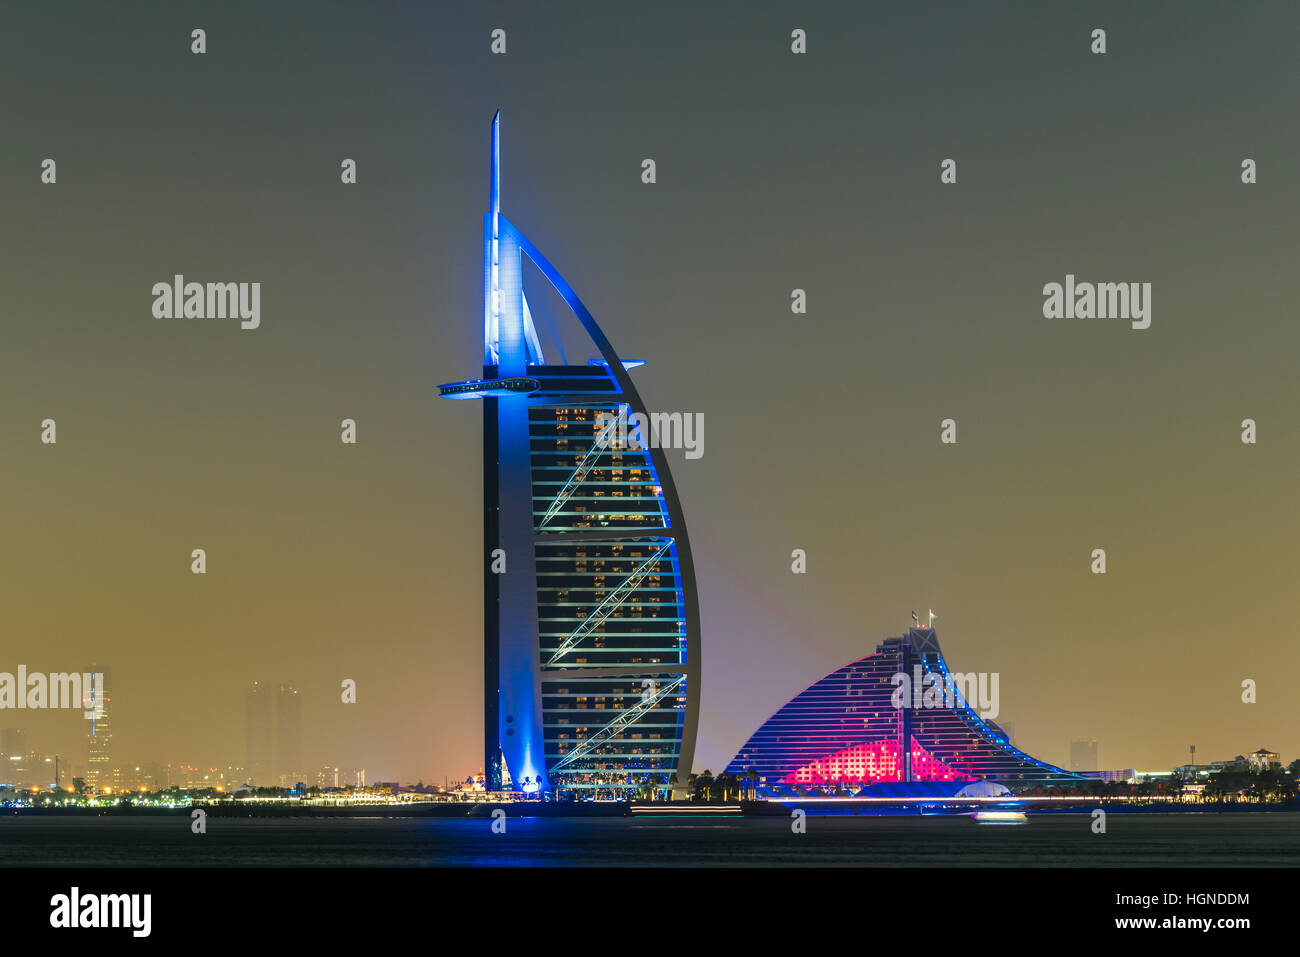 Vista de noche de Burj al Arab y Jumeirah Beach Hotel, Dubai, Emiratos Árabes Unidos. Imagen De Stock